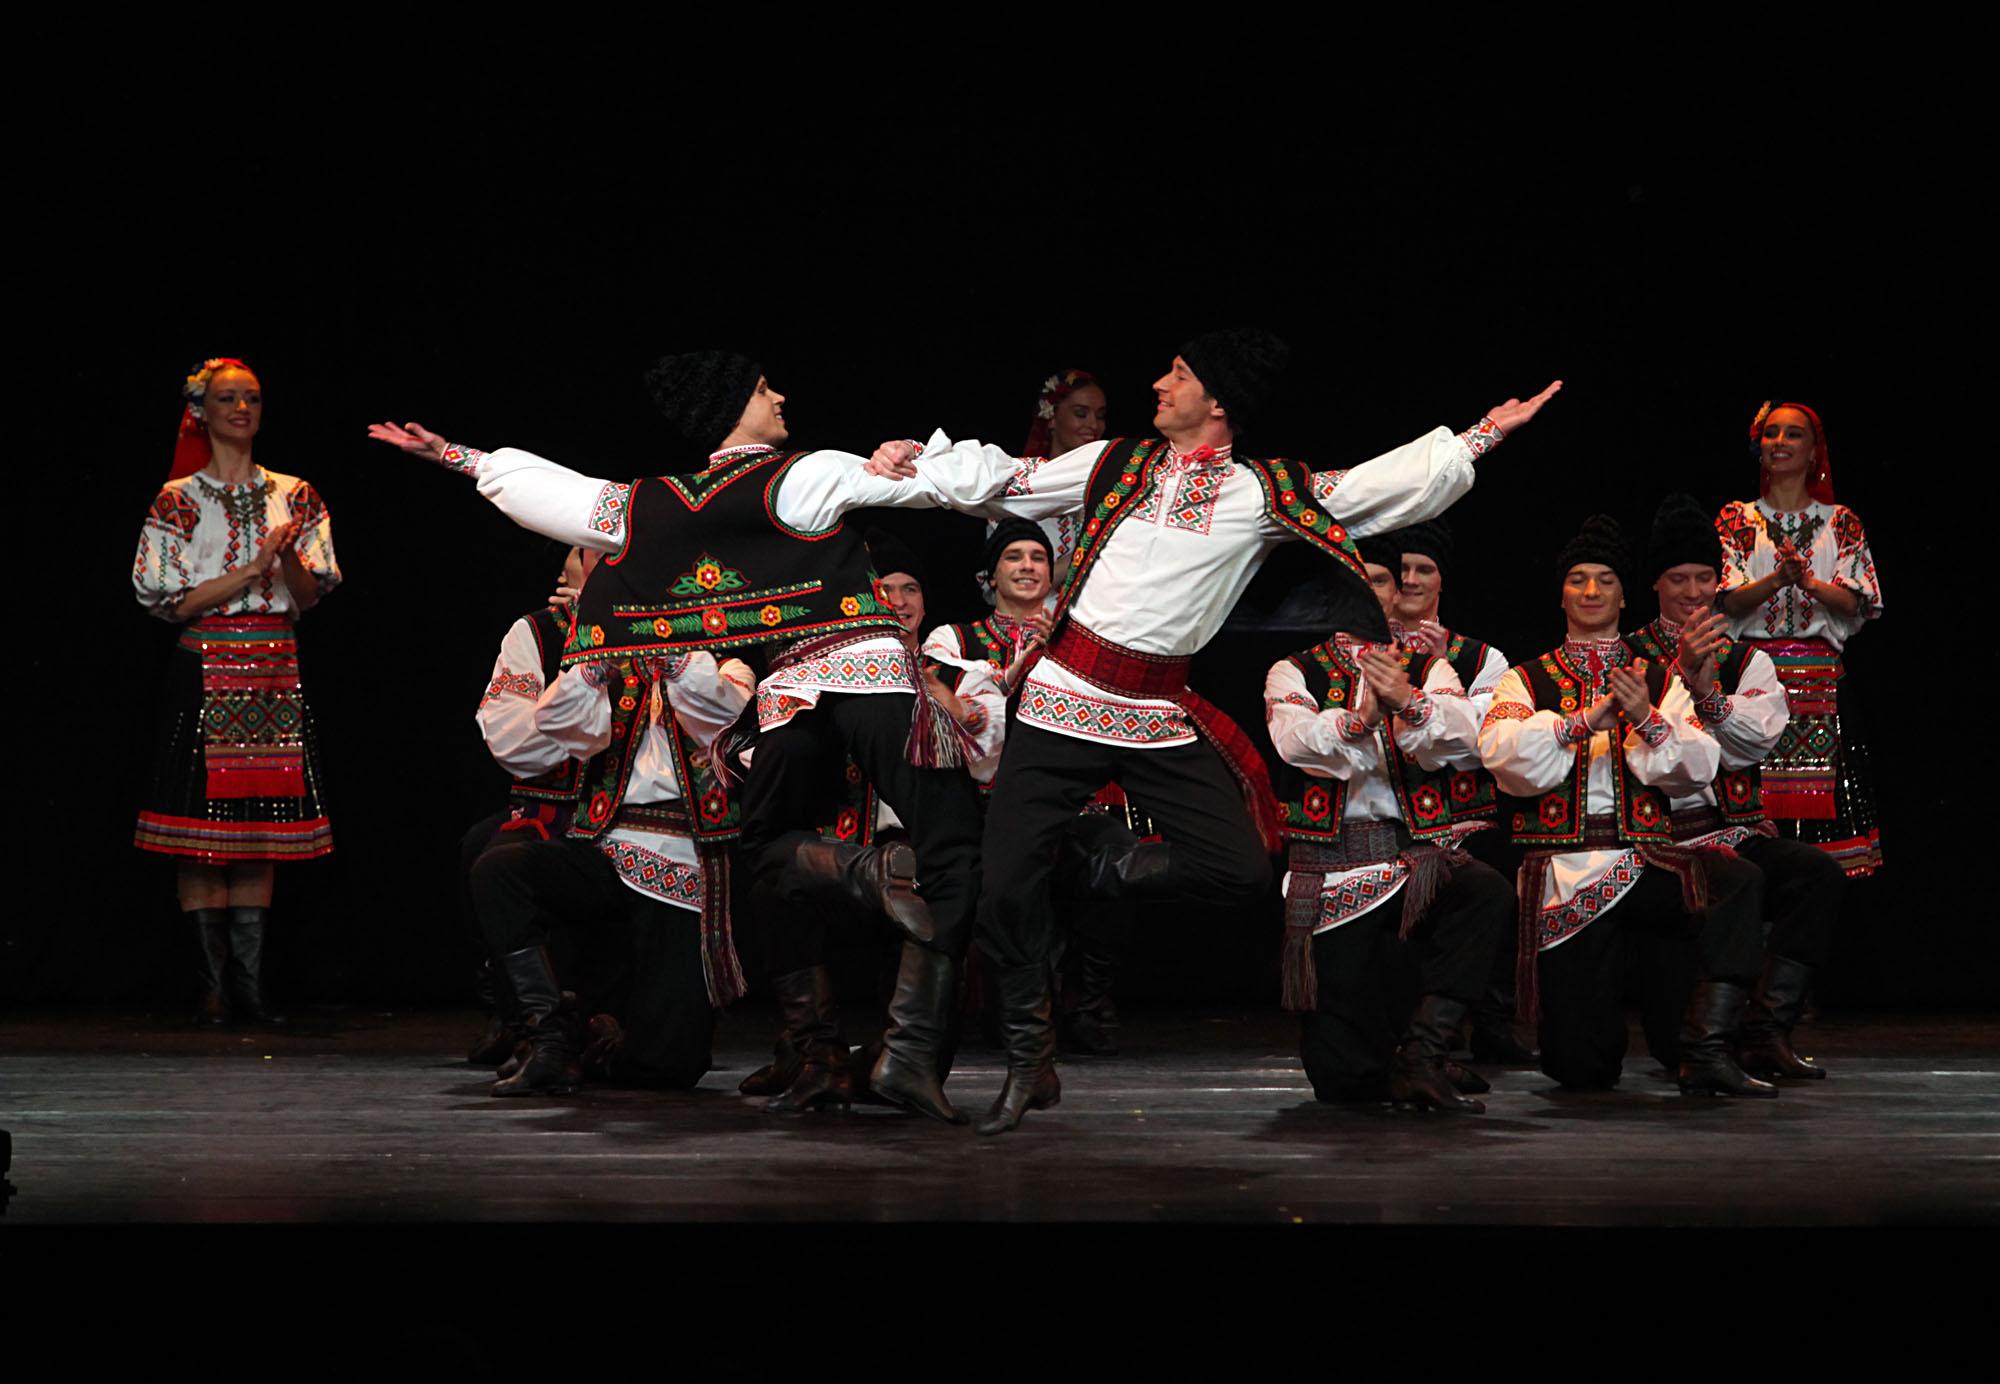 Pada akhir penampilan, Igor Moiseyev Ballet memberikan kejutan pada para penonton dengan menampilkan salah satu tradisional Indonesia — Tari Saman. Kejutan ini sontak disambut tepuk tangan meriah dari para penonton